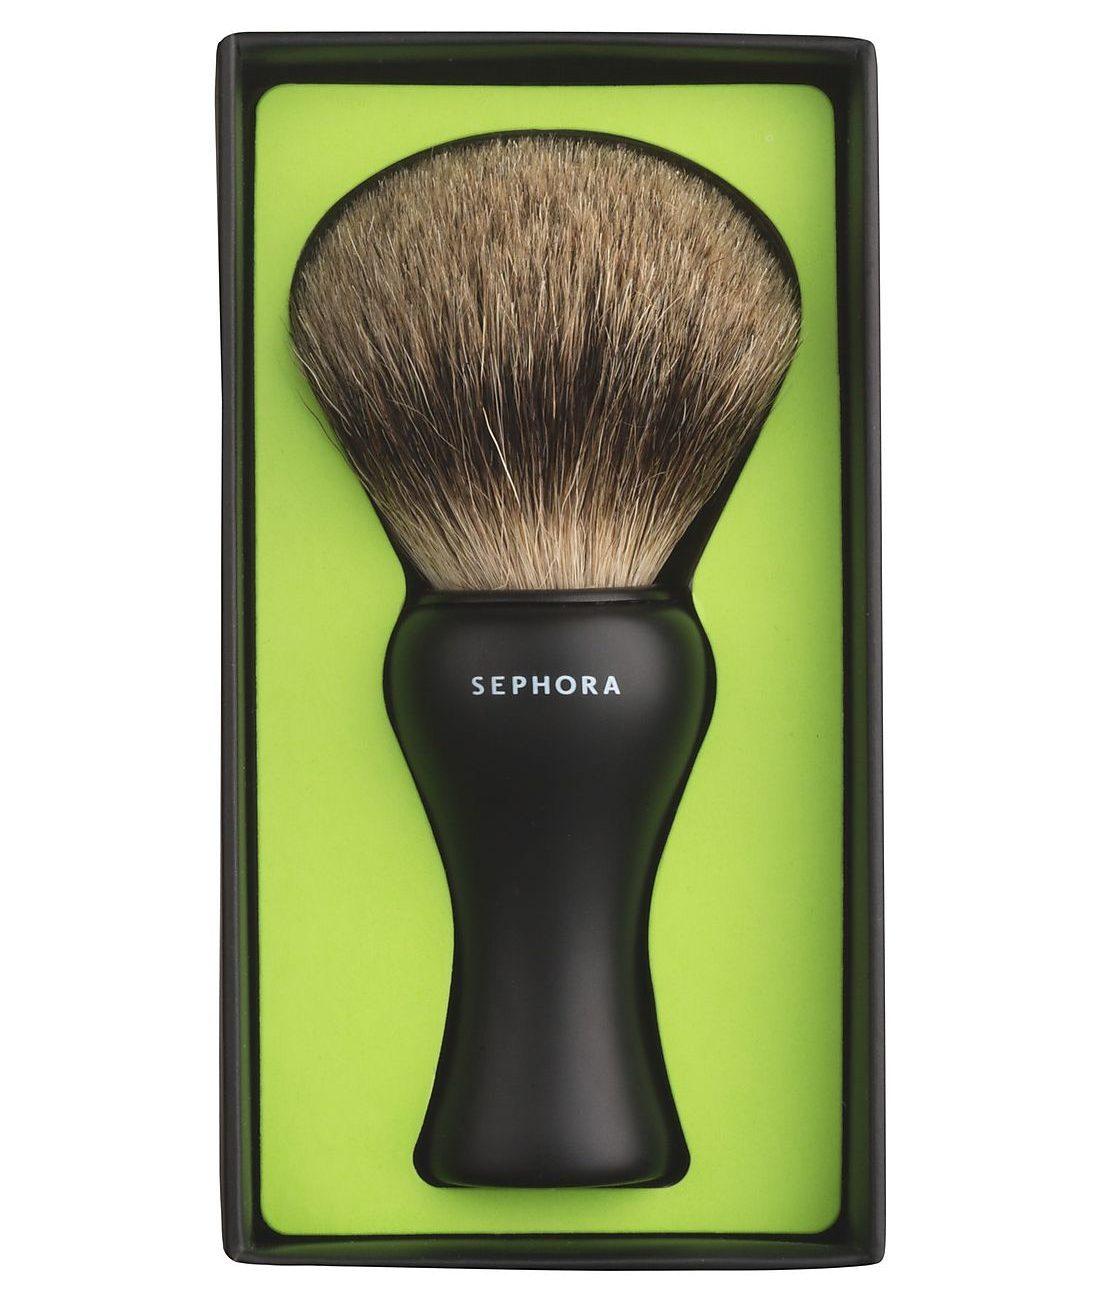 Sephora shaving Brush